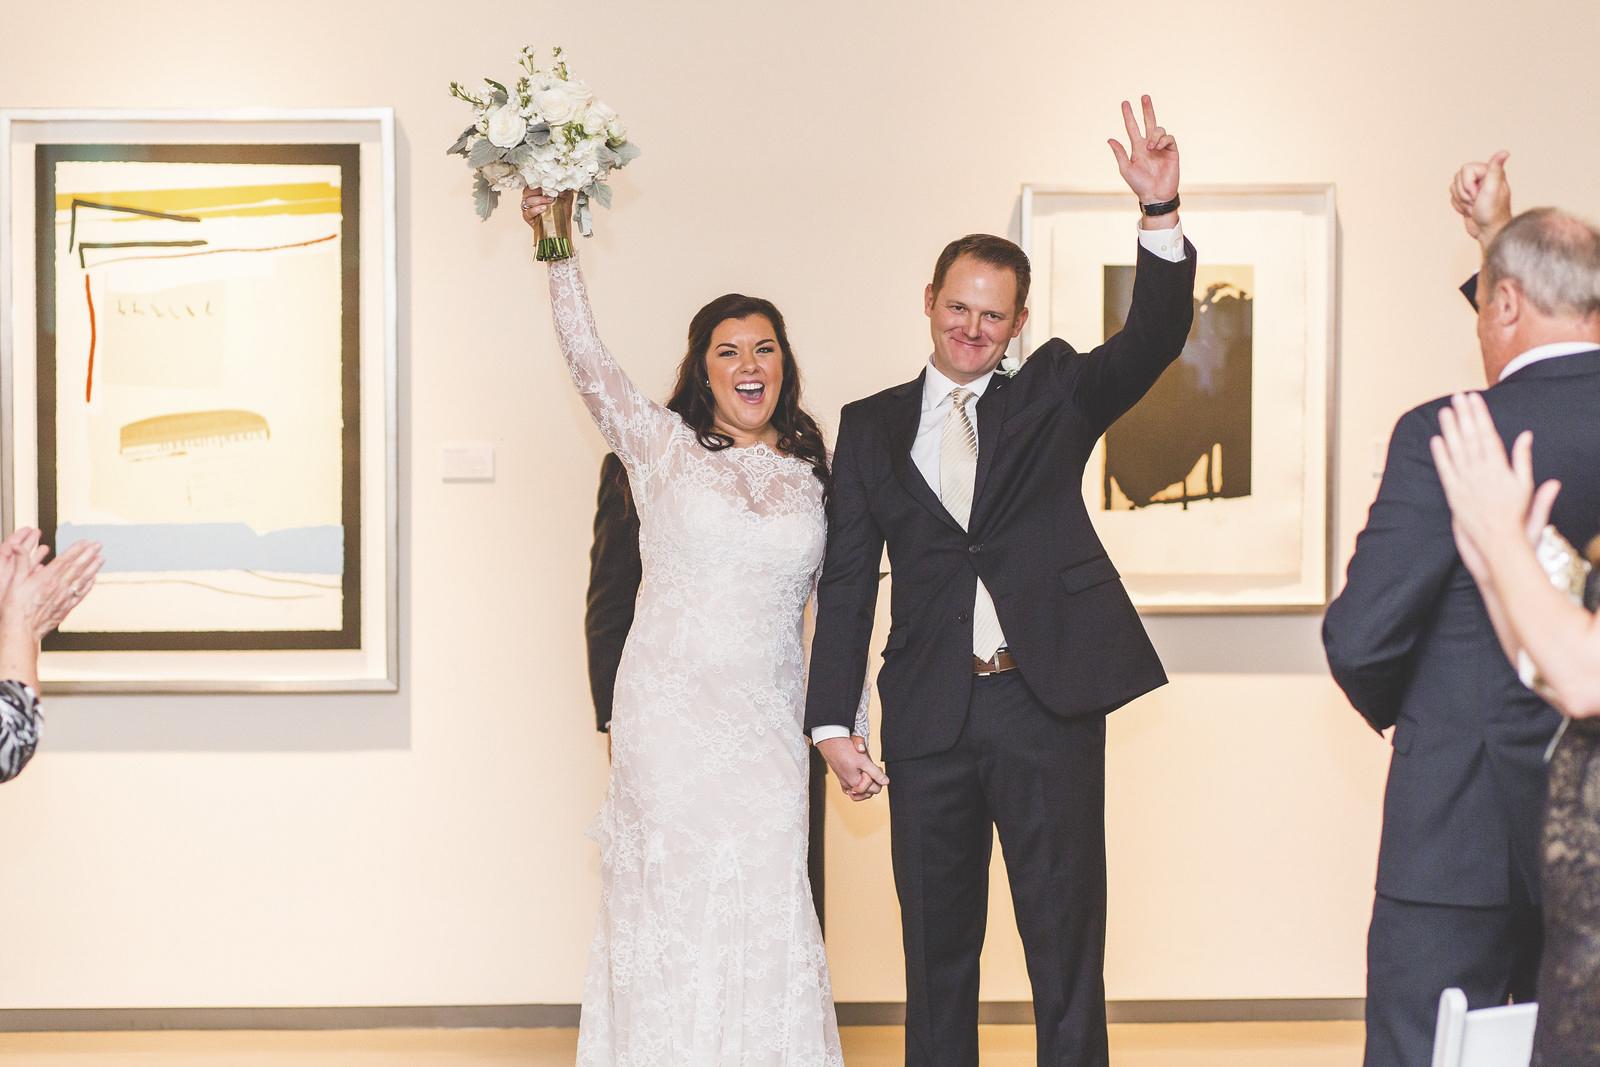 adam-szarmack-moca-wedding-jacksonville-29.jpg